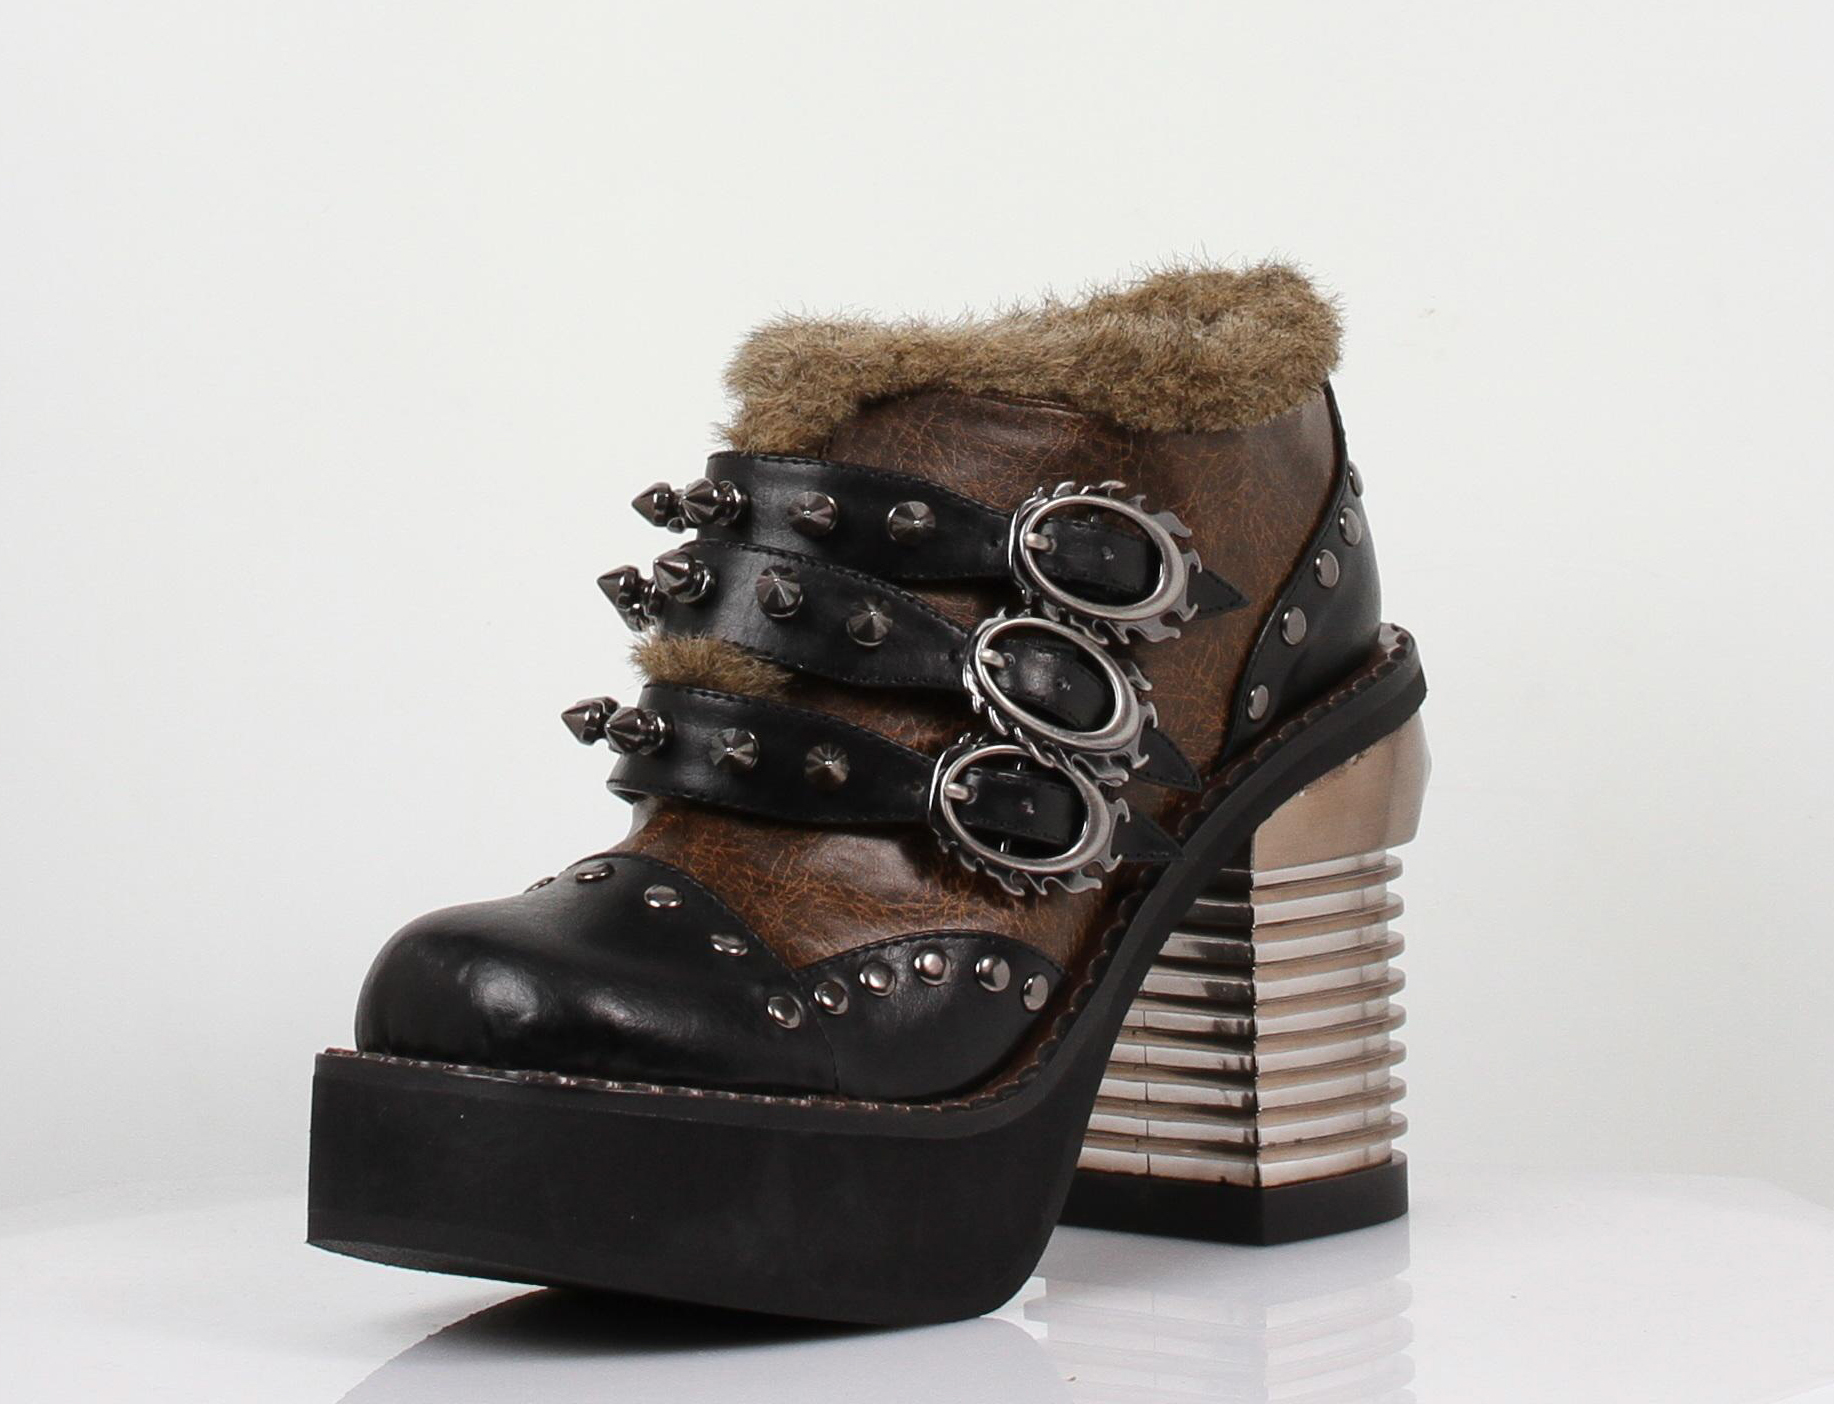 hades_shoes_womens_davorin_faux_fur_steampunk_platforms_platforms_3.jpg